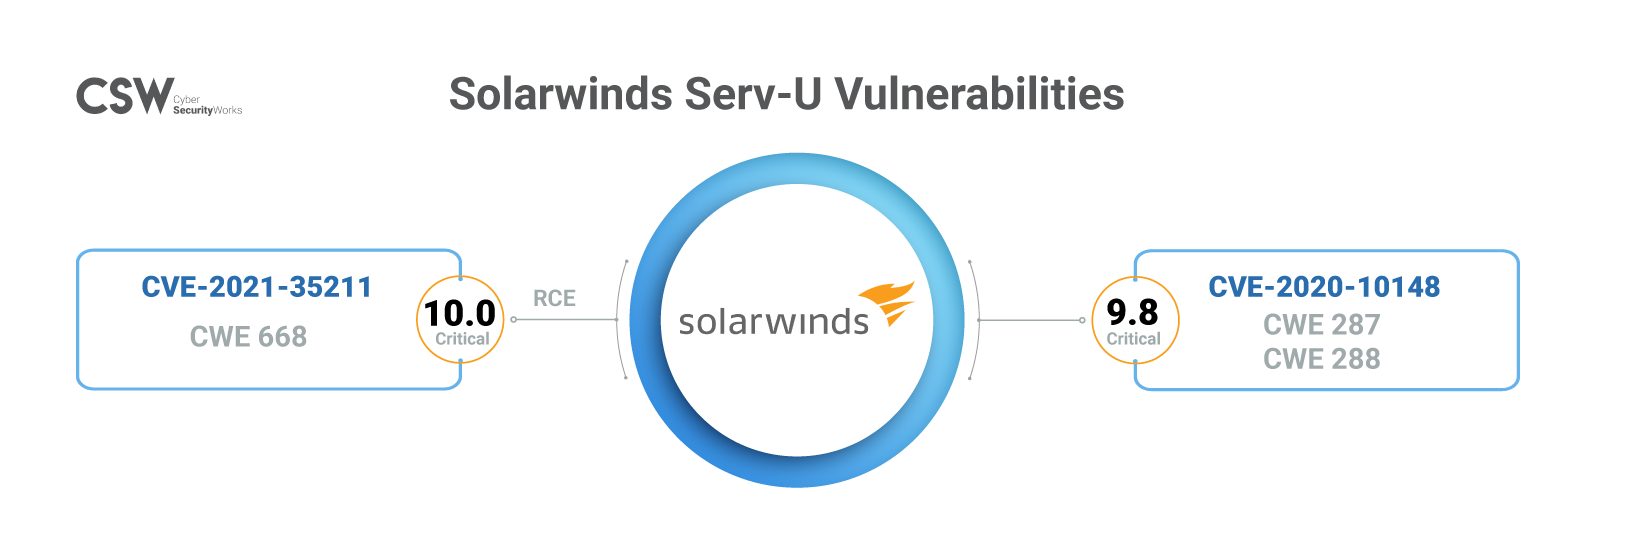 Solarwinds CVE infographic